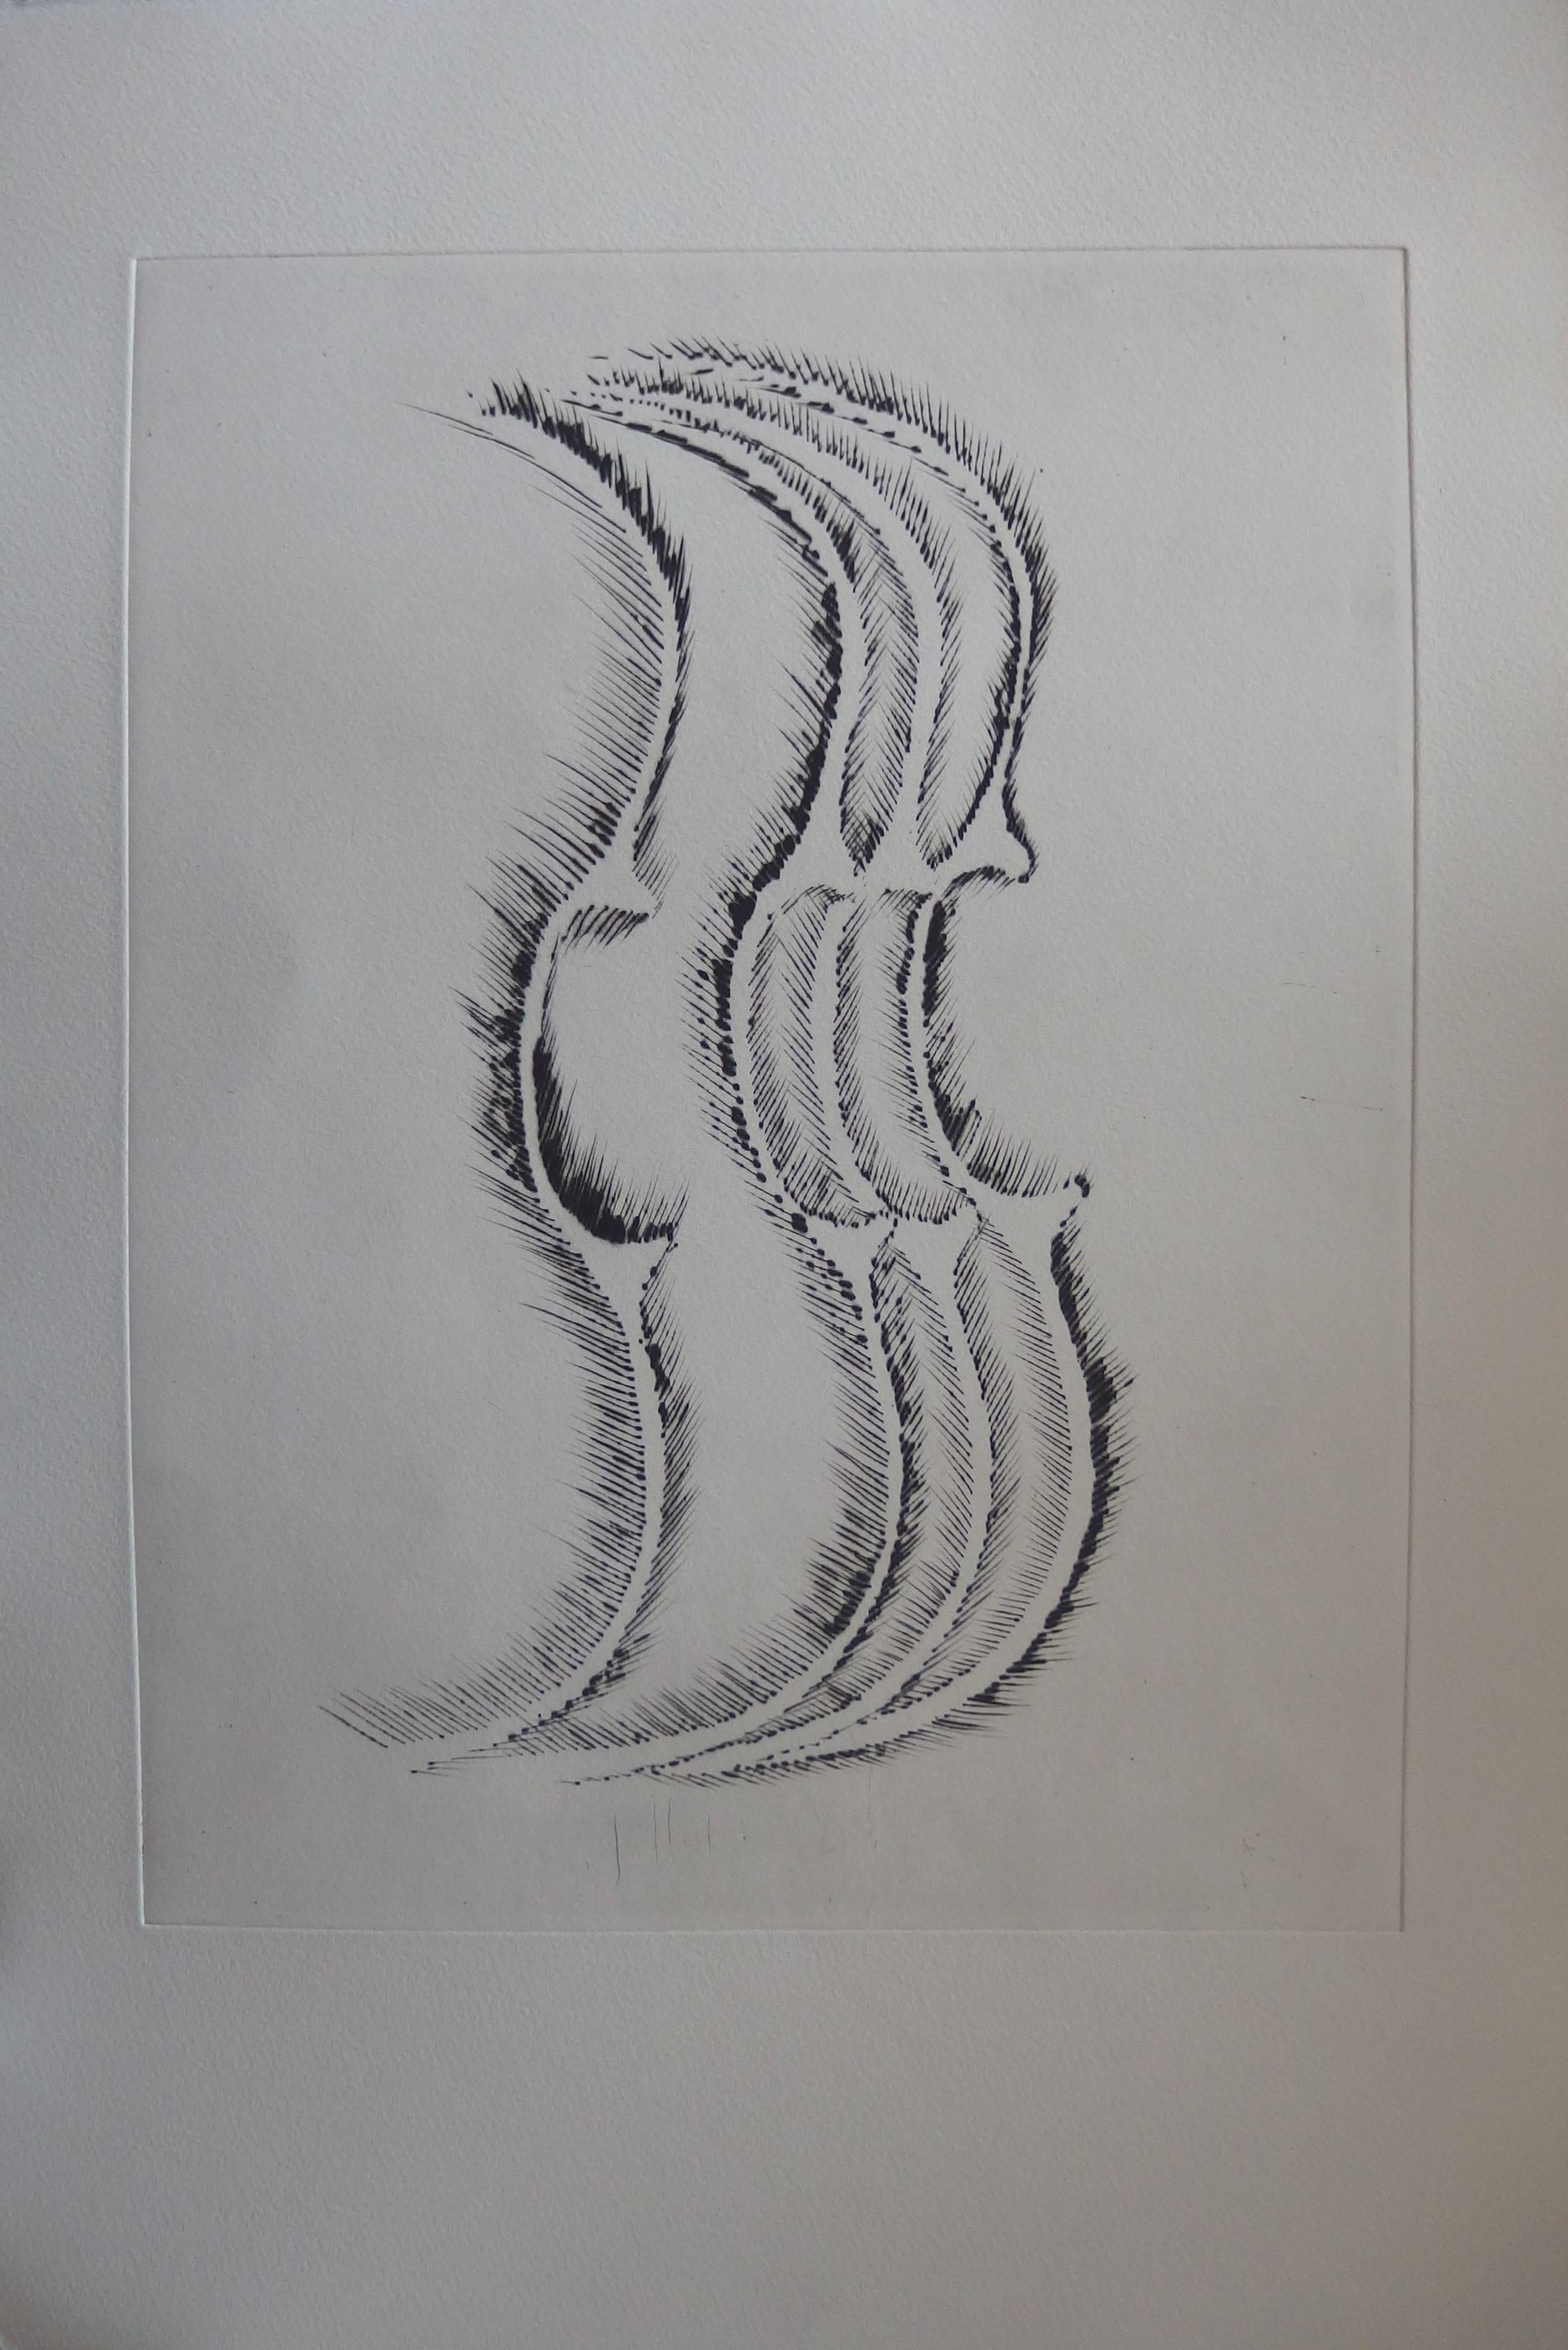 Violin profile - Original etching - 1979